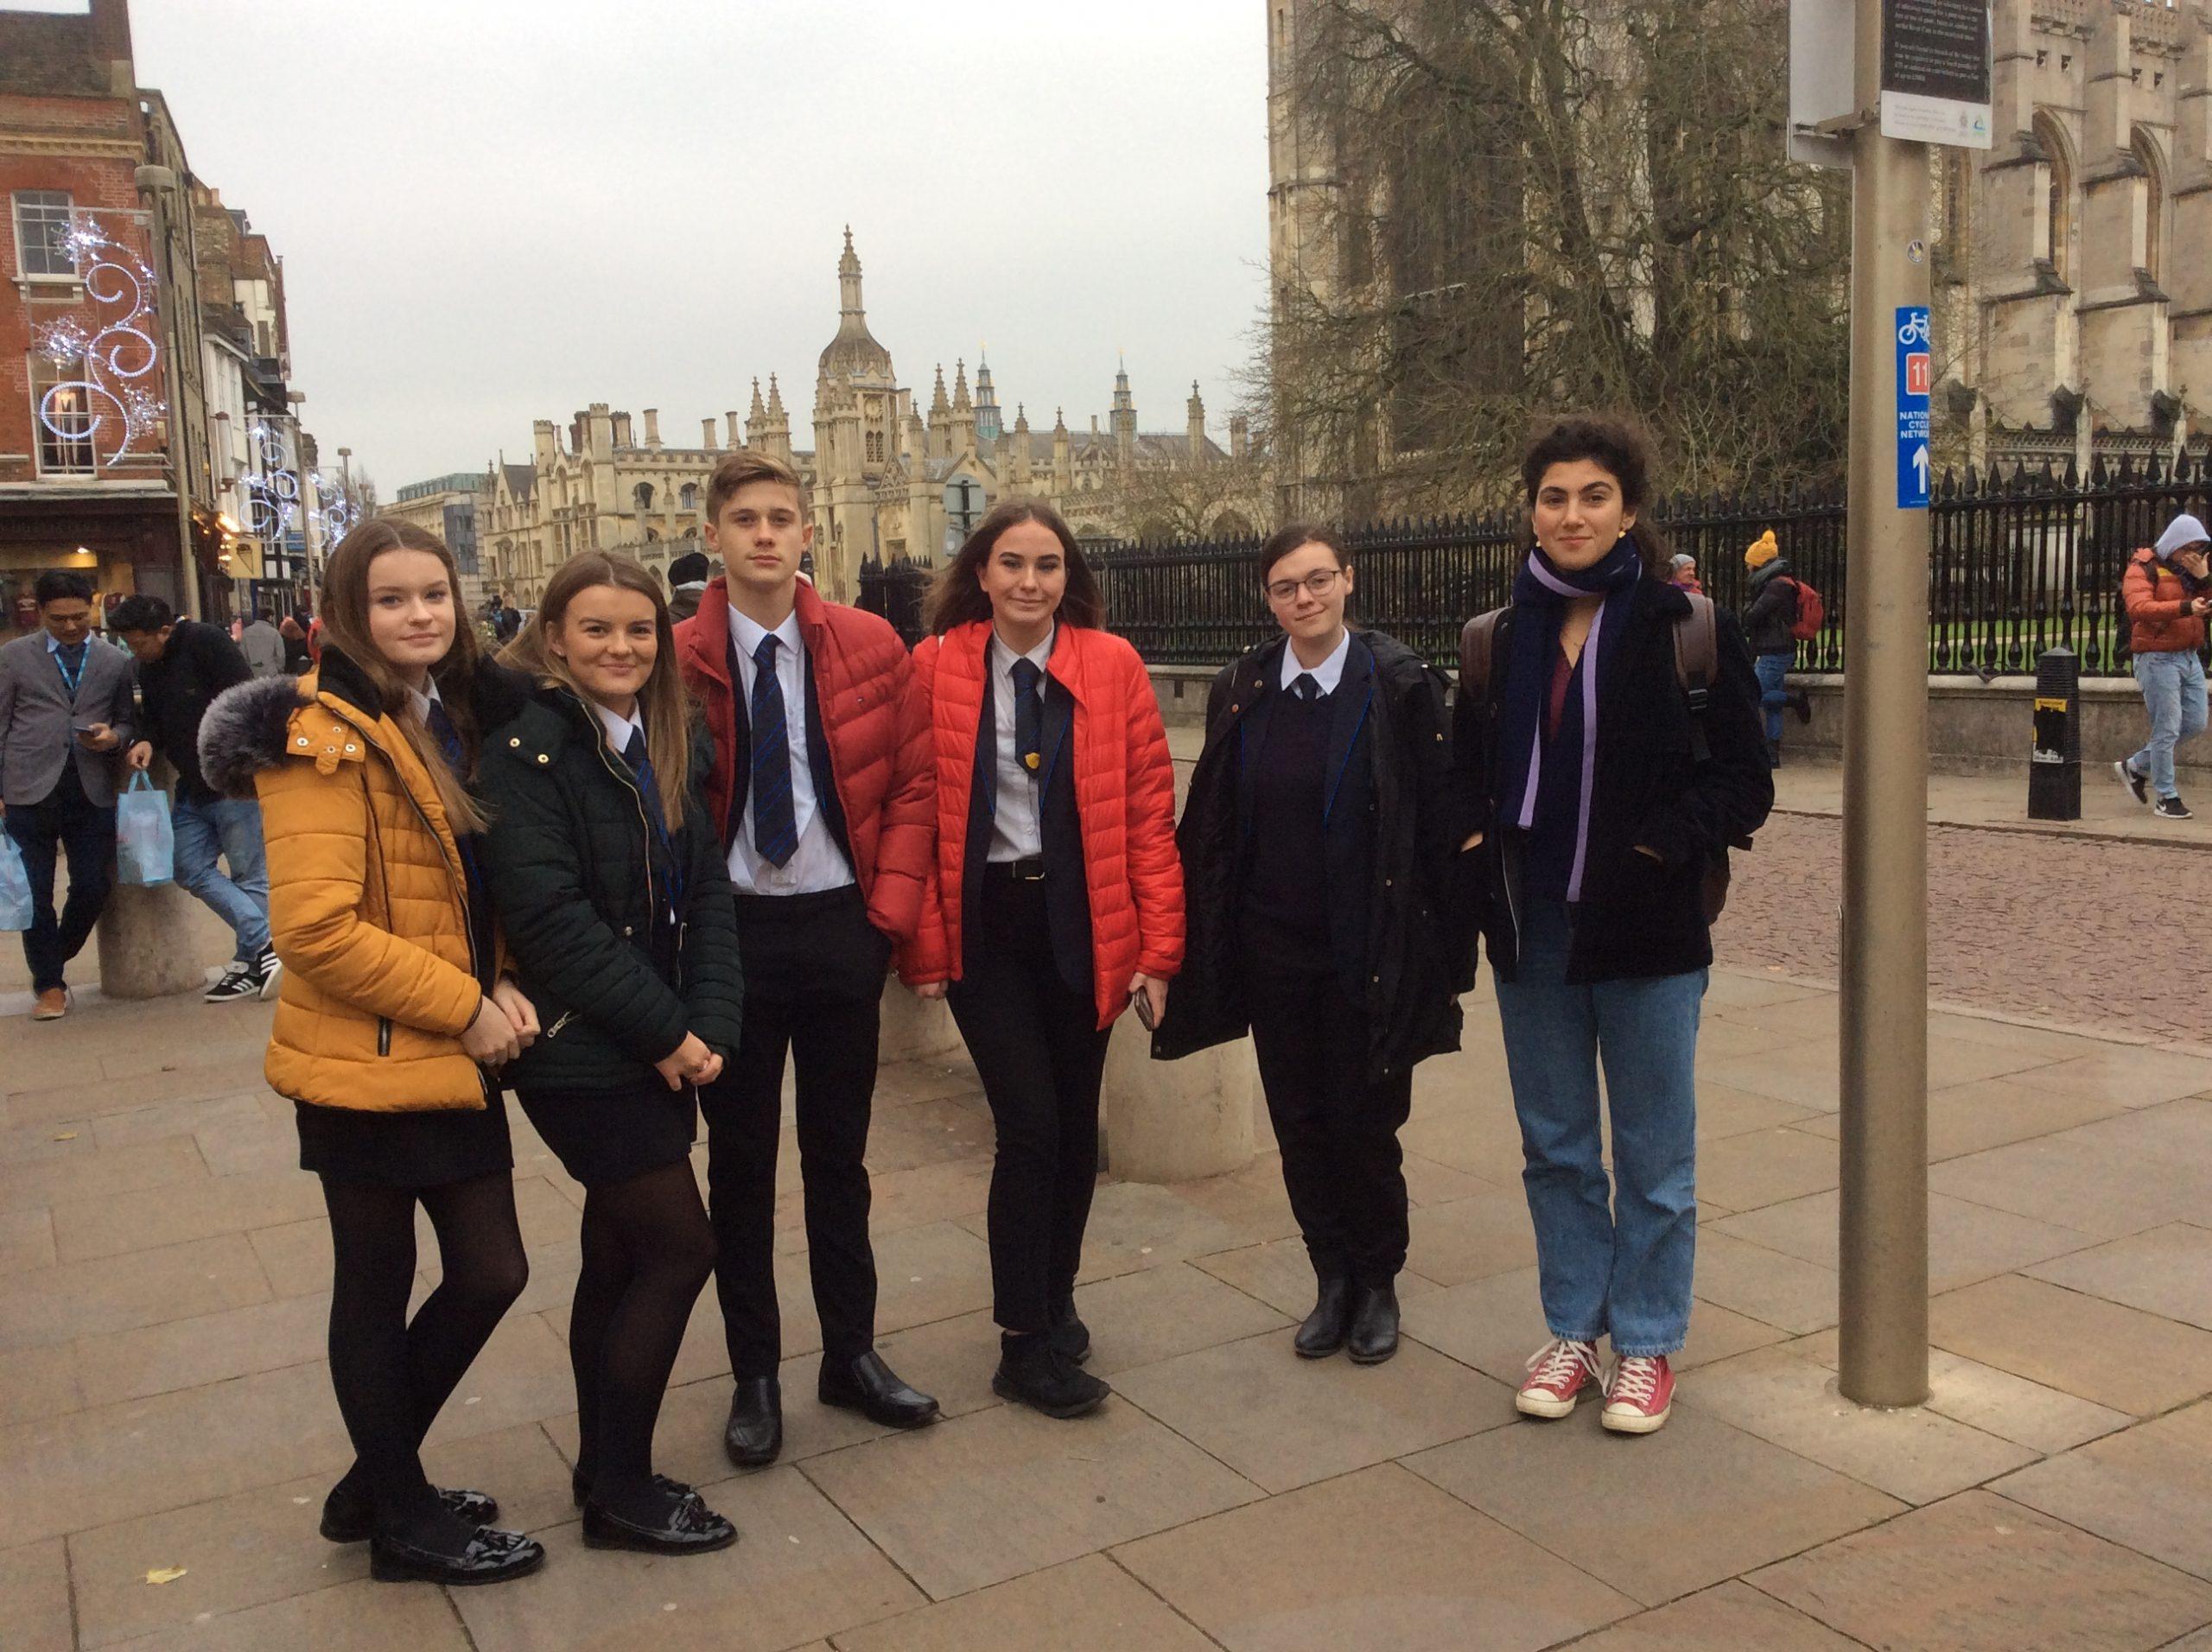 Ysgol Clywedog Cambridge University